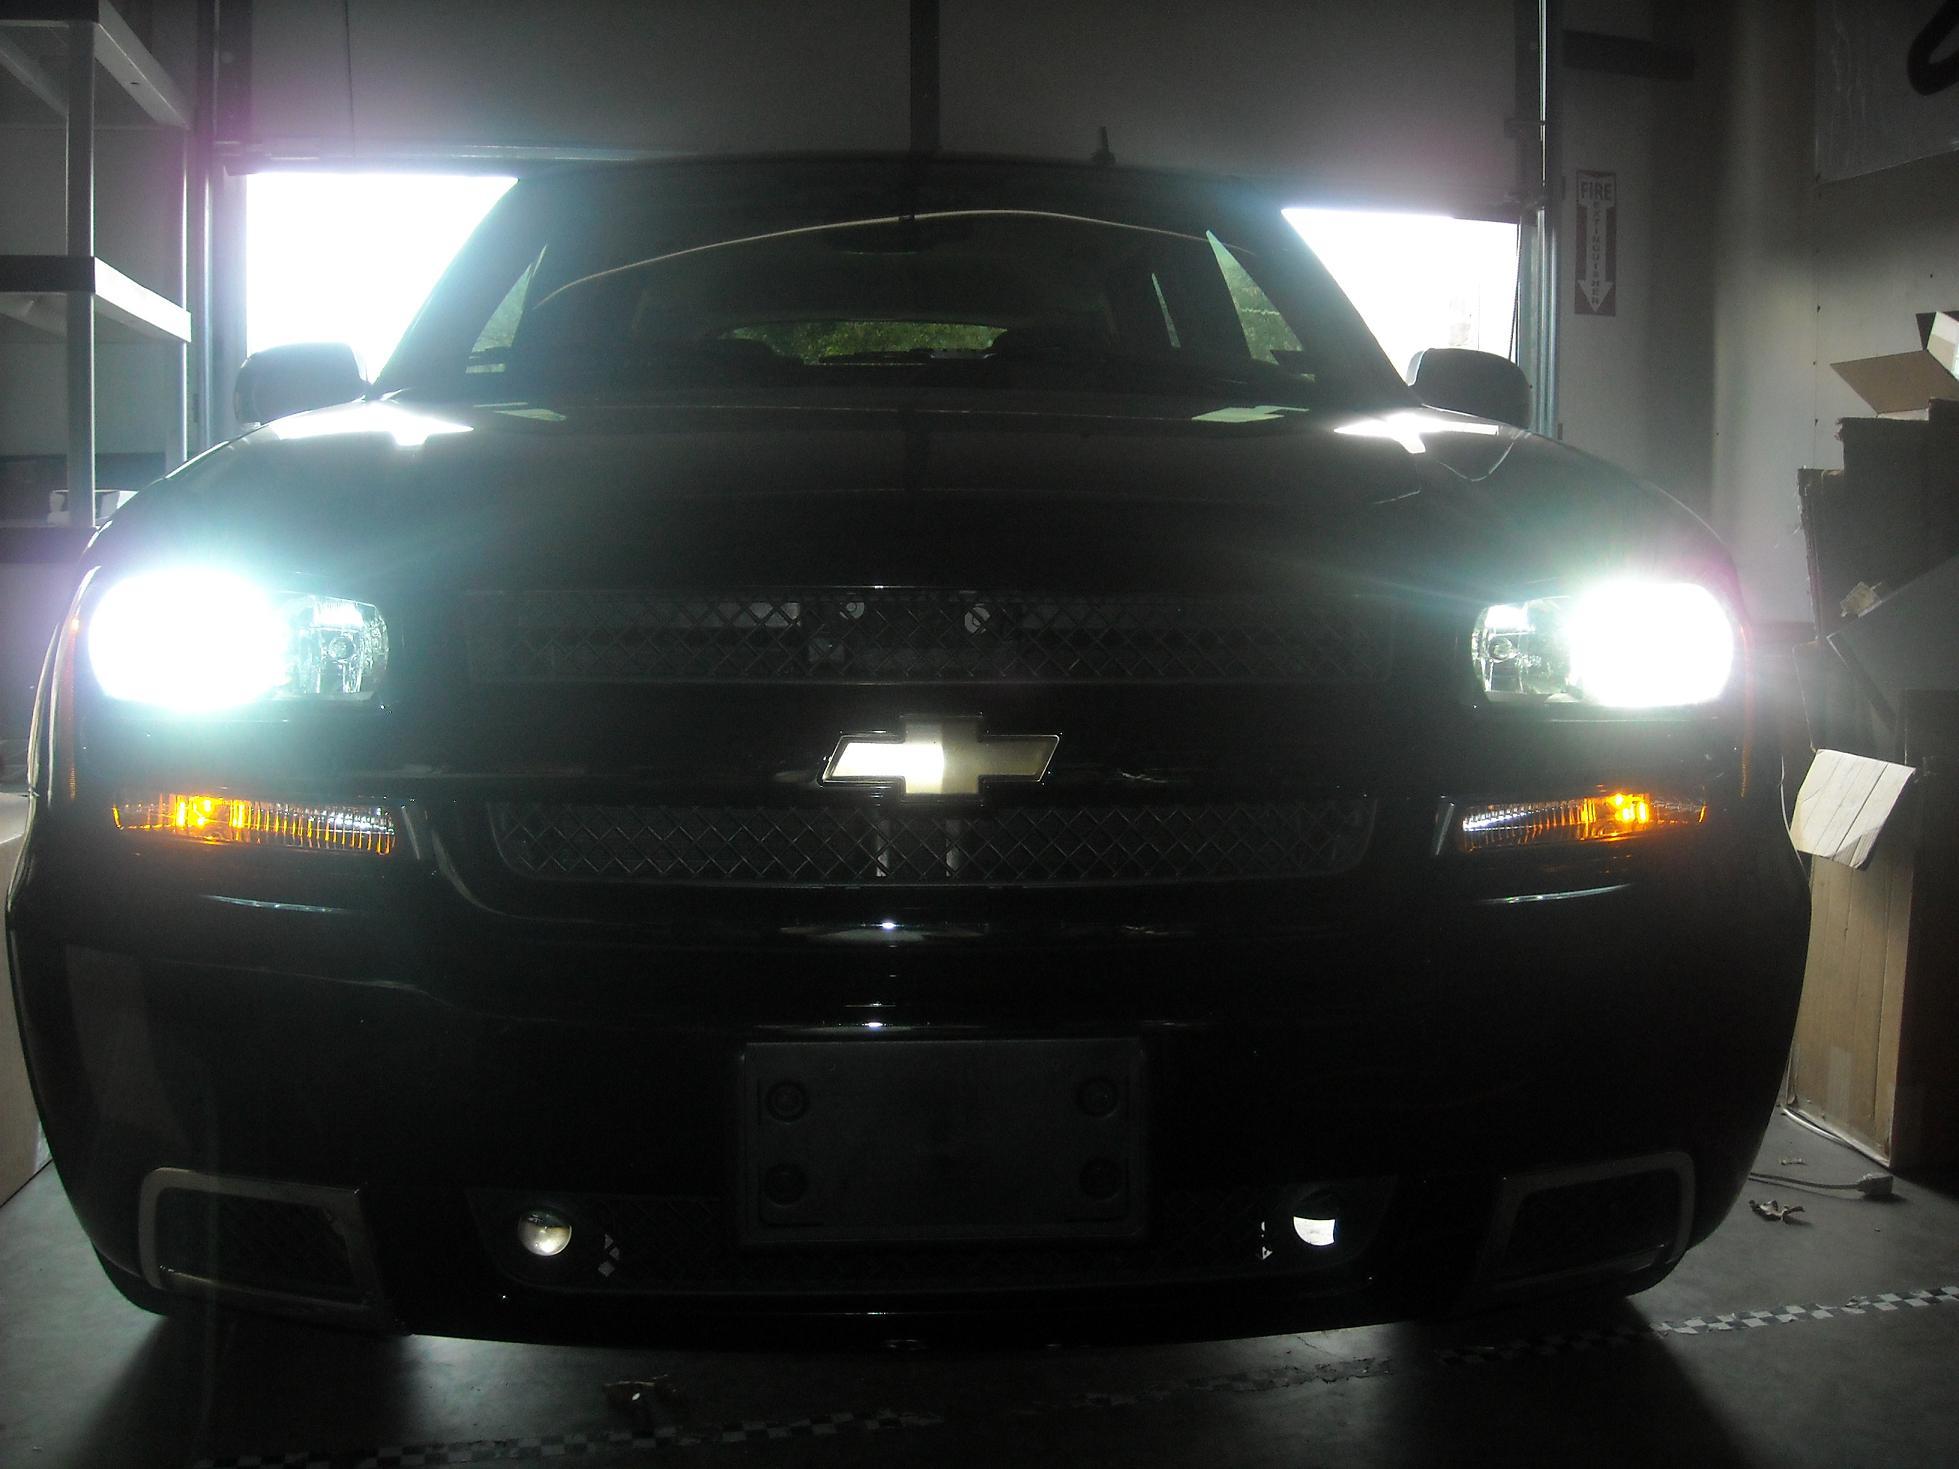 Details About 03 09 Chevrolet Trailblazer Ss Chevy Blazer Custom Hid Kit Ac Digital H I D